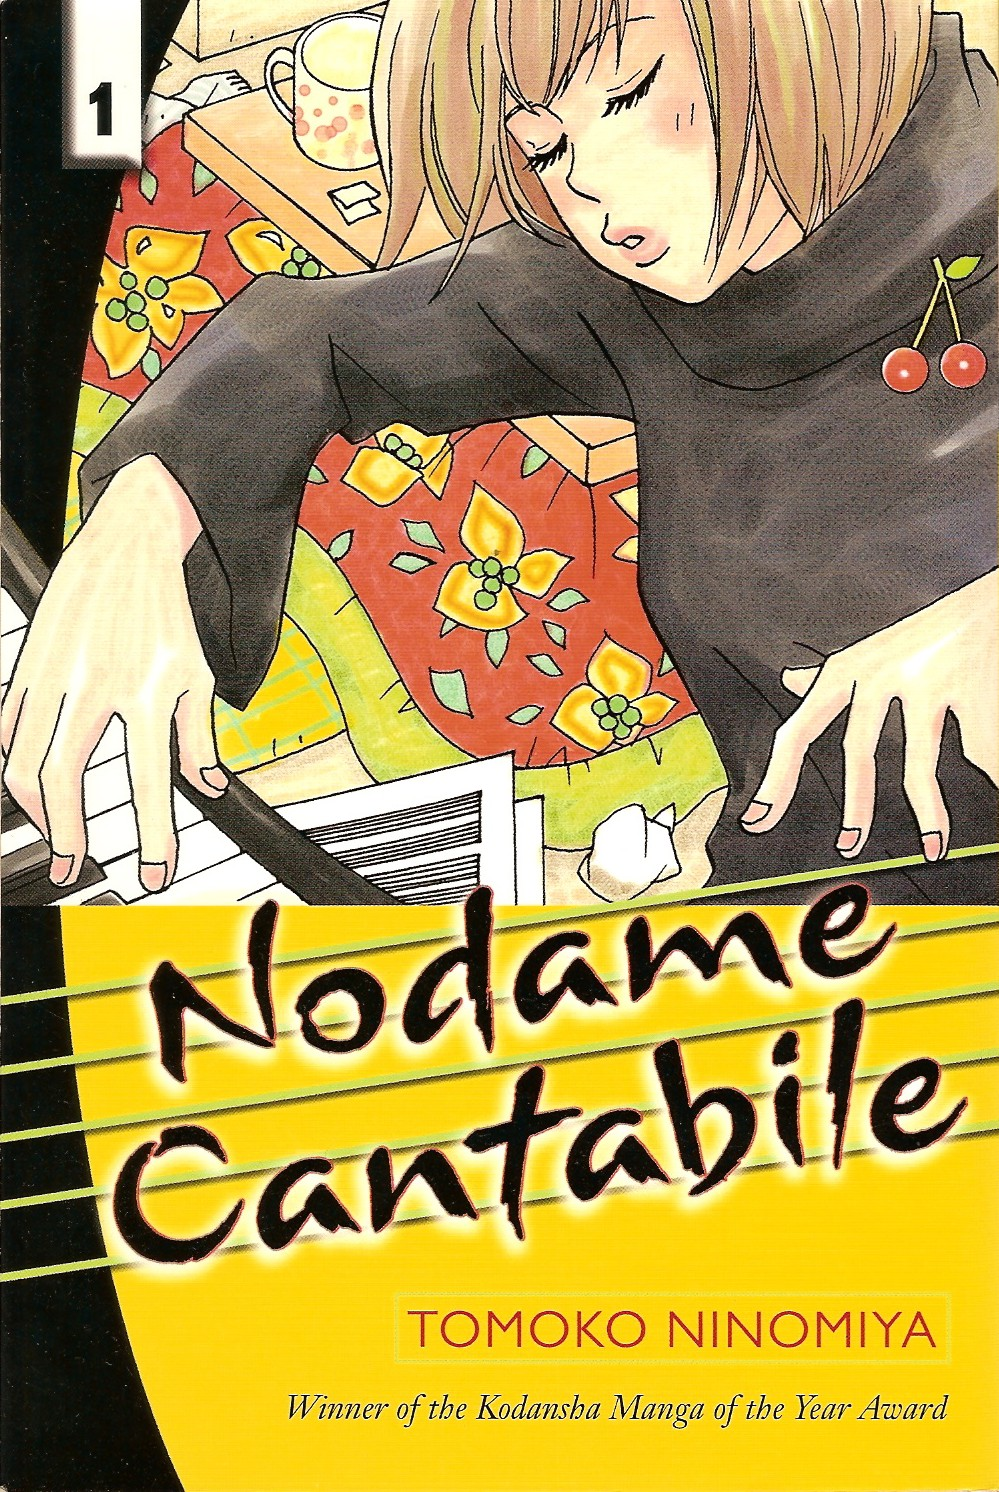 Manga Манга «Nodame Cantabile» Tomoko Ninomiya.